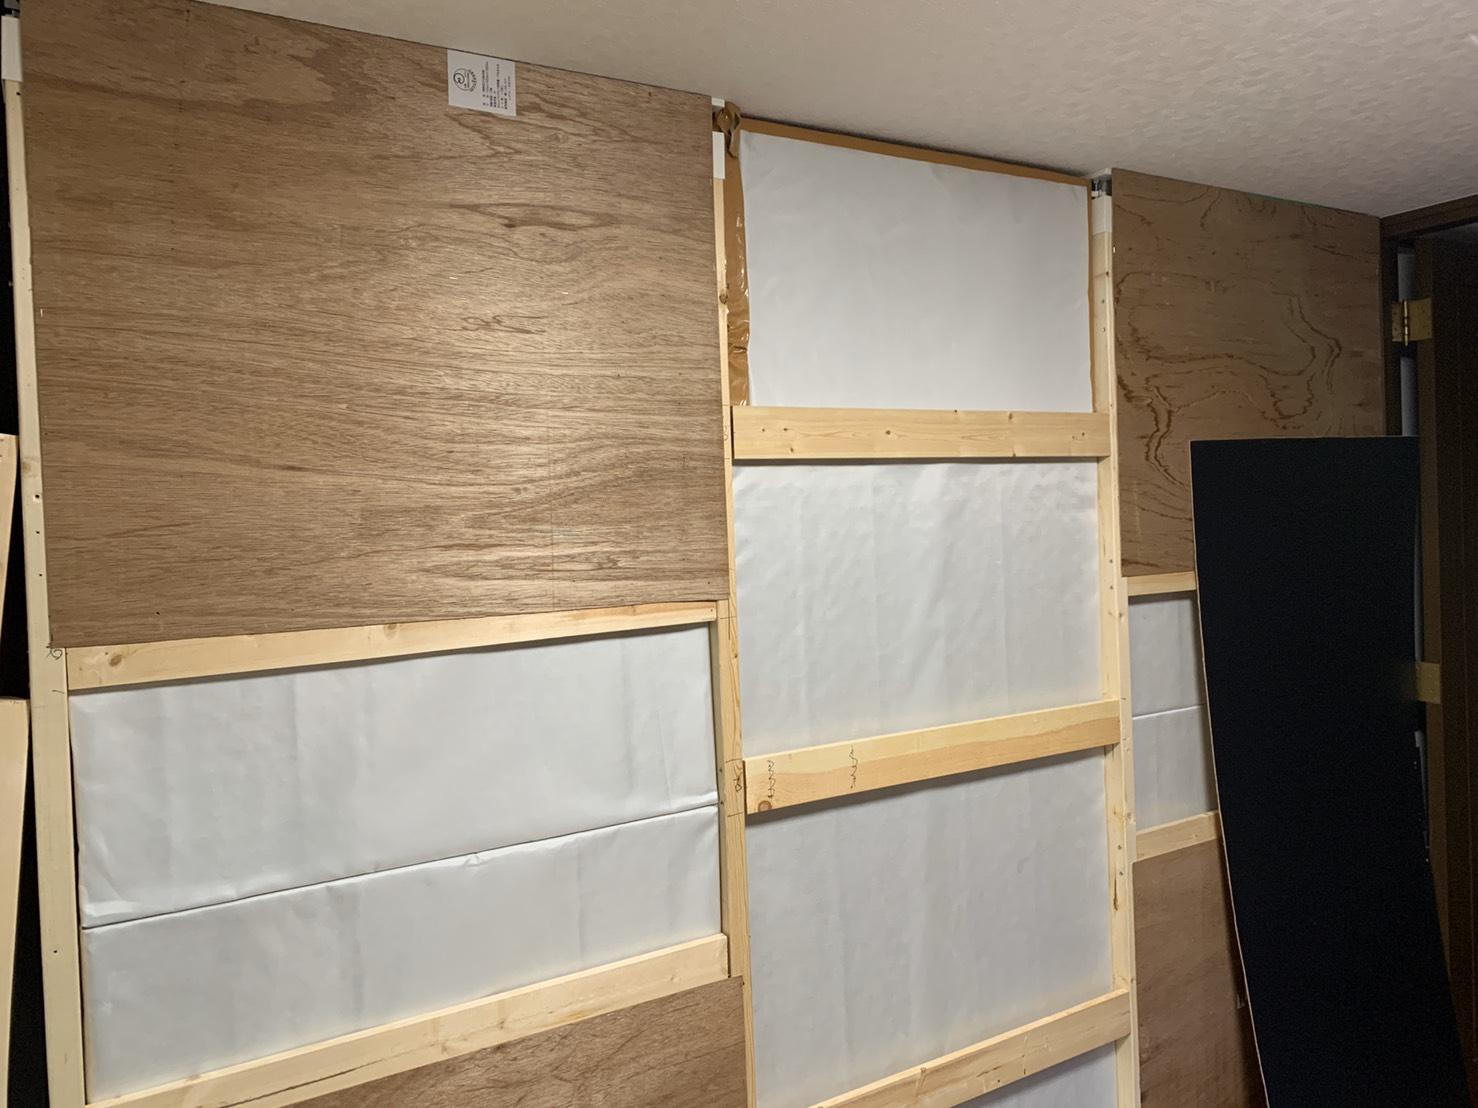 Diyで防音室を作ろう その 壁材を貼る Acappellabo 音楽家 富本泰成のホームページ